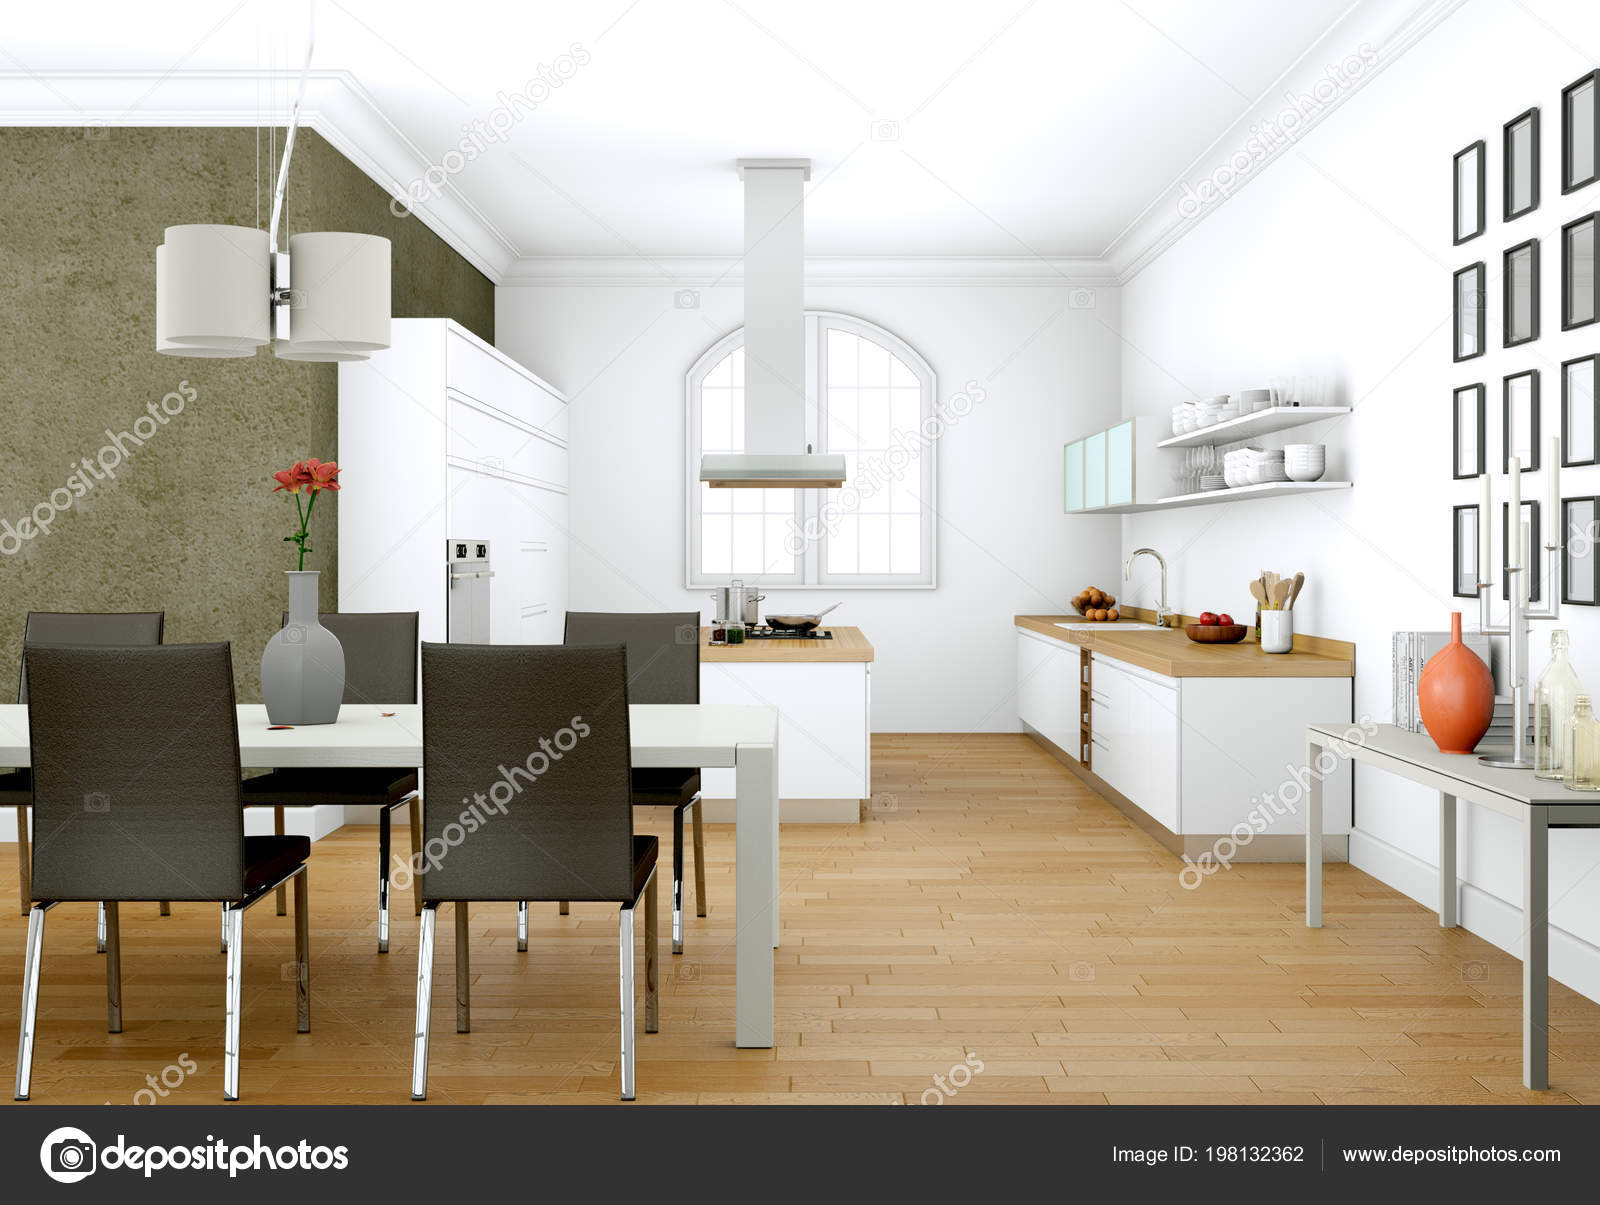 Arredamento Da Interno Moderno.Arredamento Sala Da Pranzo In Appartamento Moderno Foto